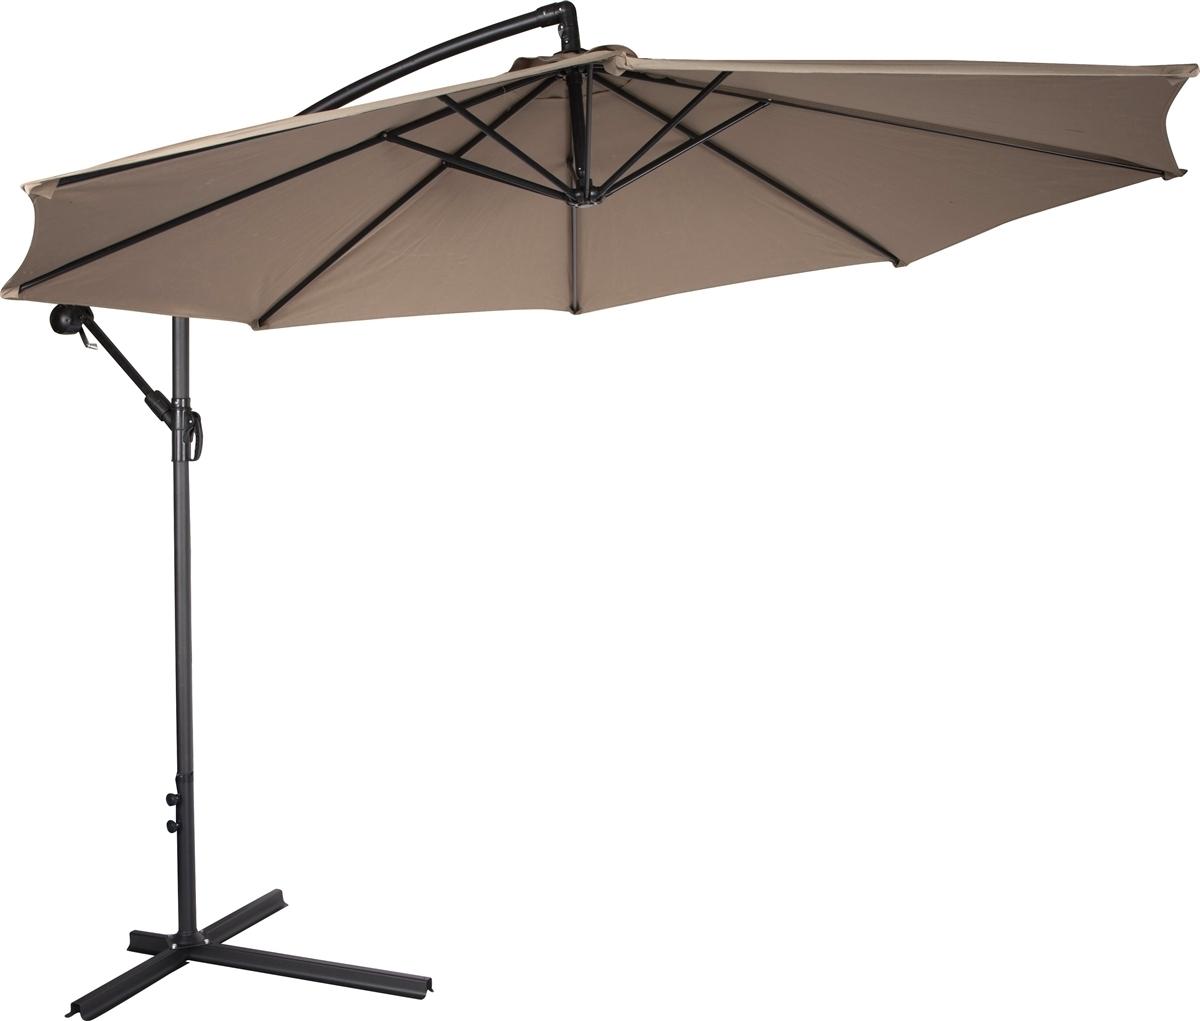 Popular Custom Sunbrella Patio Umbrellas Intended For Buy Patio Umbrellas Custom Printed Square Canopy Market Umbrella (View 20 of 20)